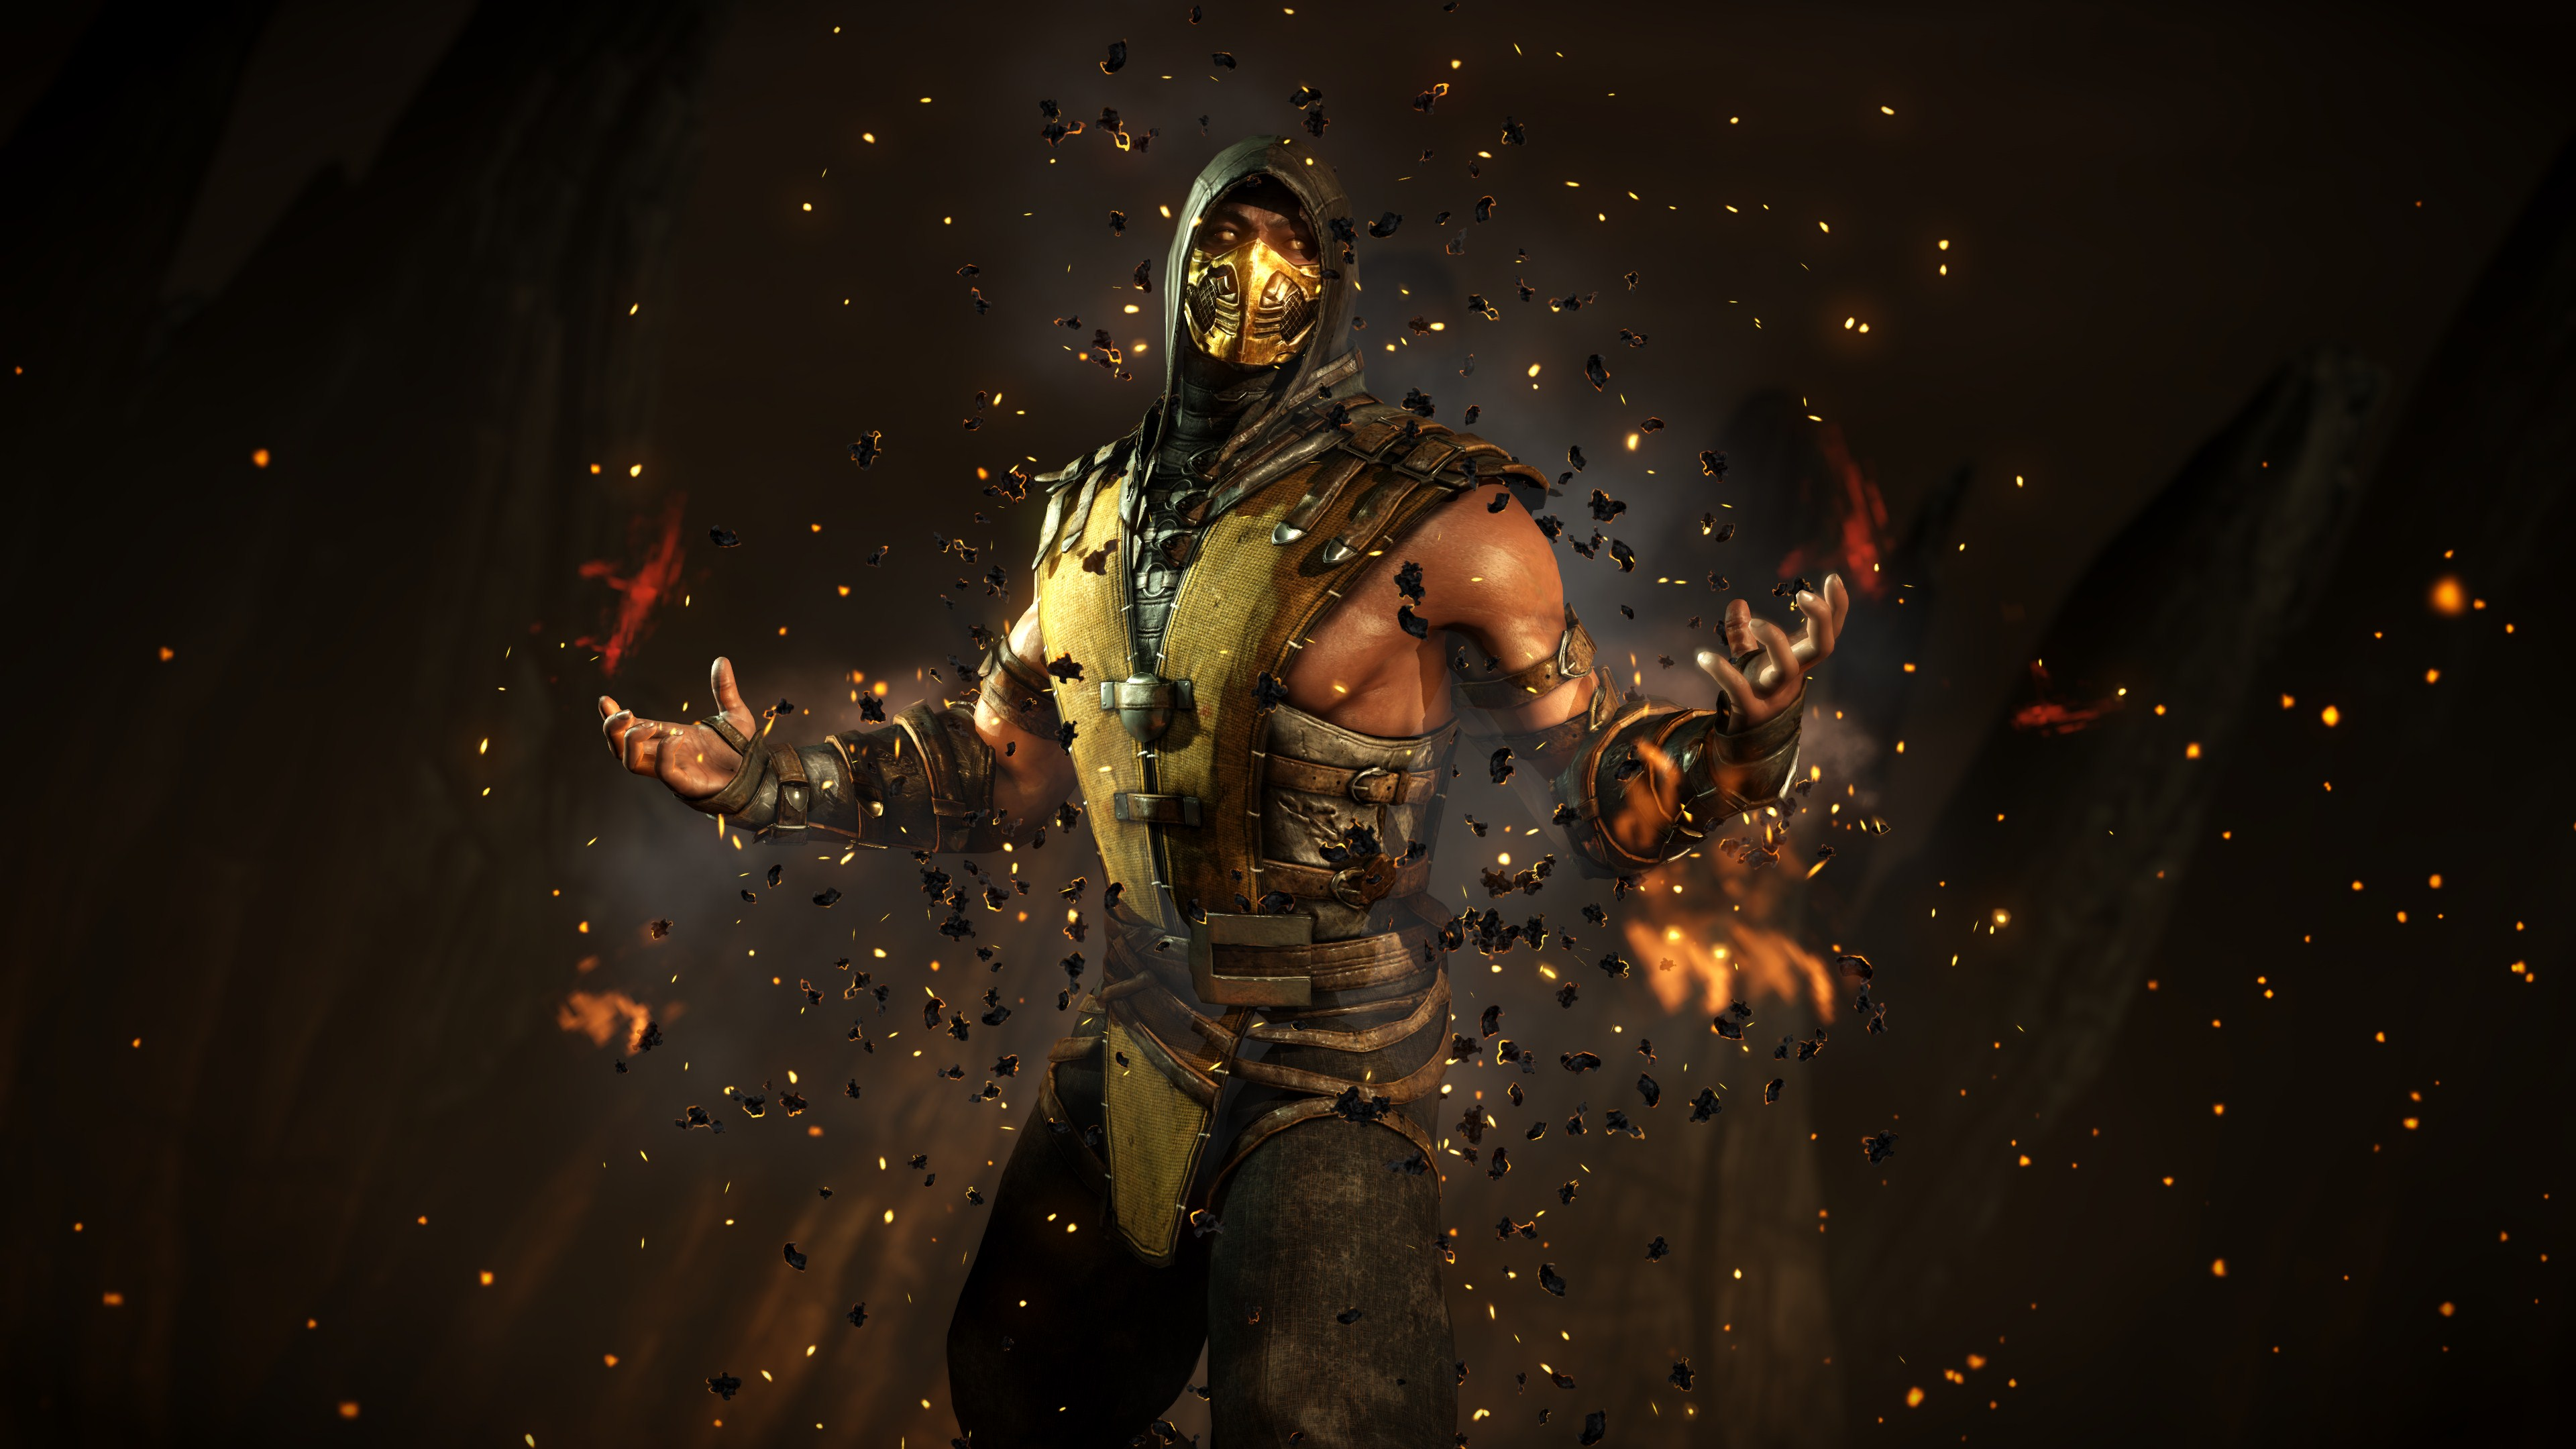 Free Download Mortal Kombat X Scorpion Wallpaper 3840x2160 For